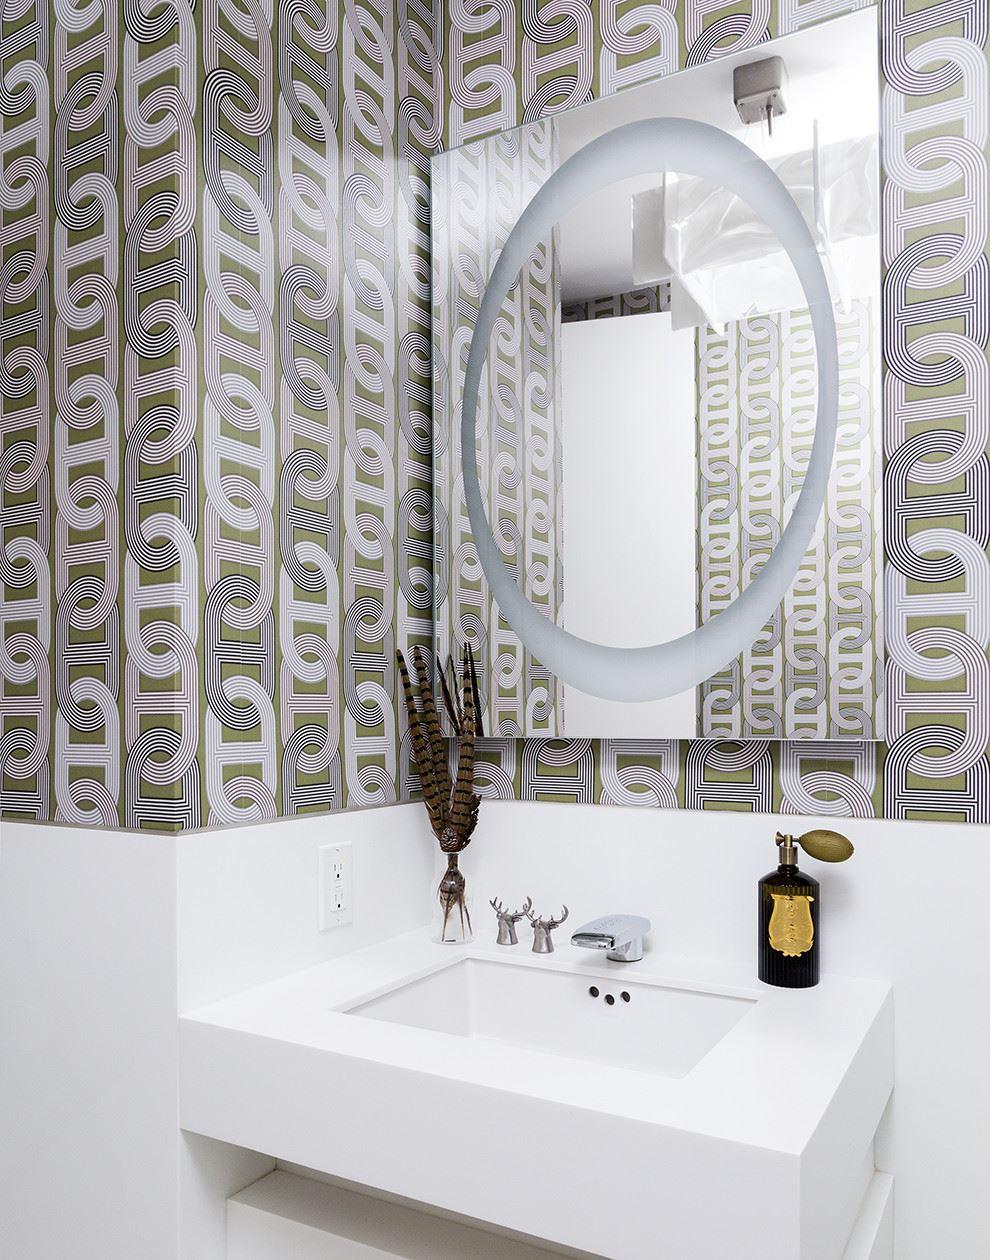 Nice Bathrooms Ideas Wallpaper Bathrooms Canada A New York City Bathroom Create A Bathroom On A Budget Wallpaper View Gallery Geometric Wallpaper houzz 01 Wallpaper For Bathrooms